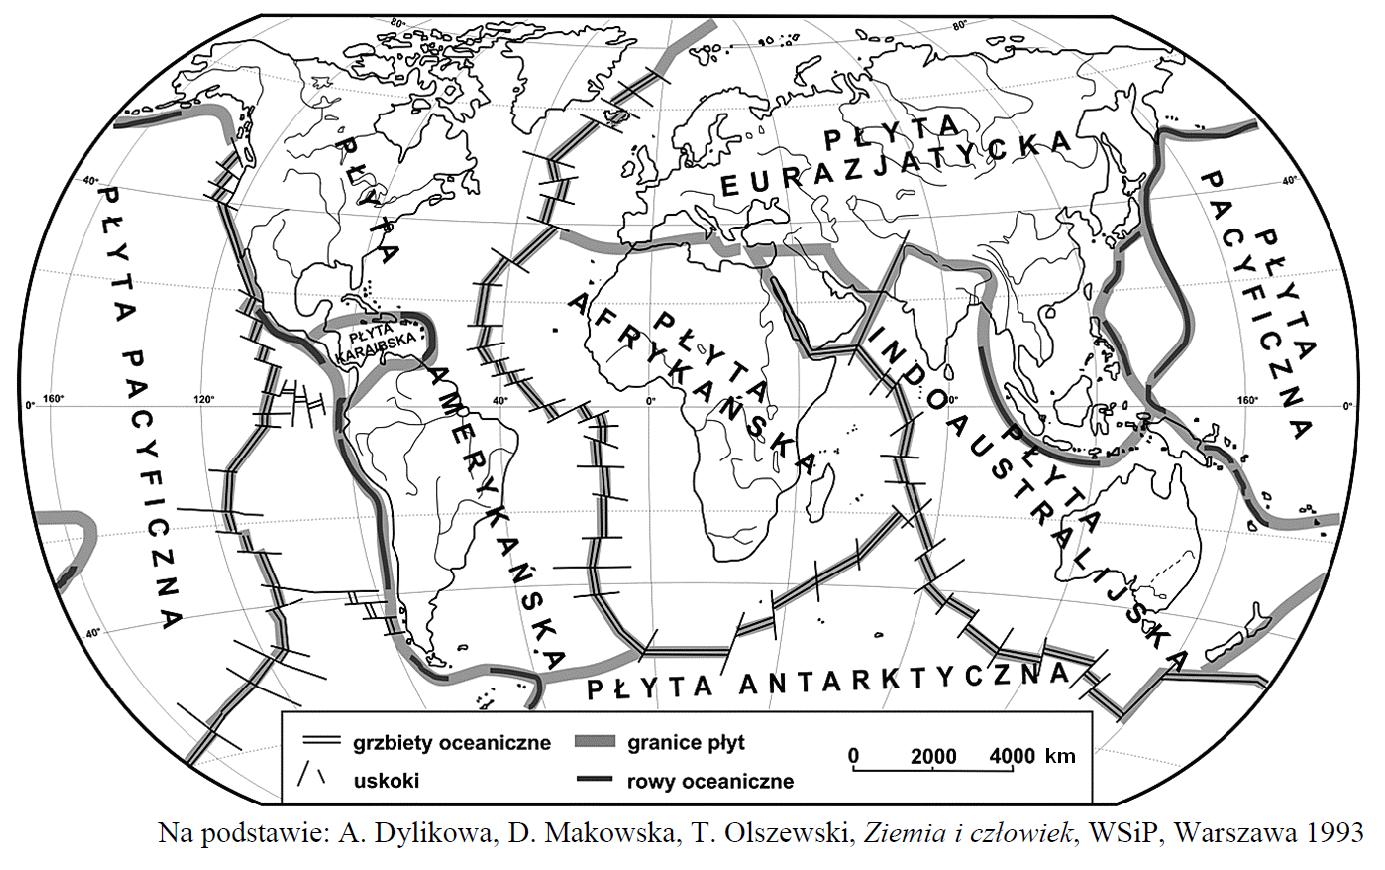 matura zgeografii 2012 maj pp zadanie 14